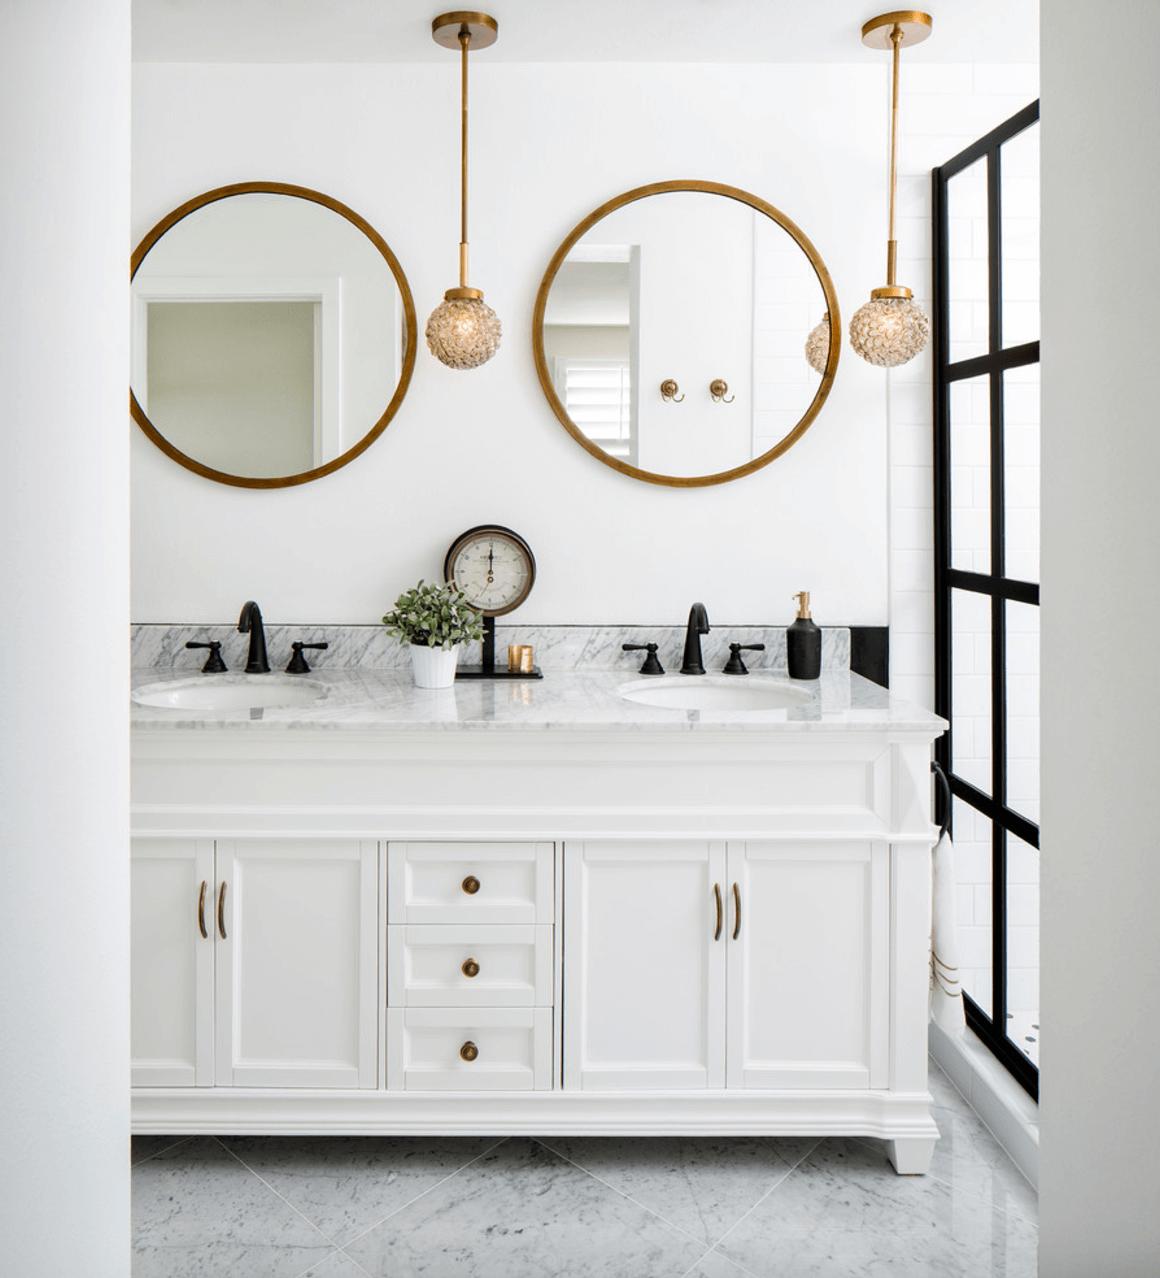 round mirrors & ceiling pendants | Bathroom Faucets | Pinterest ...